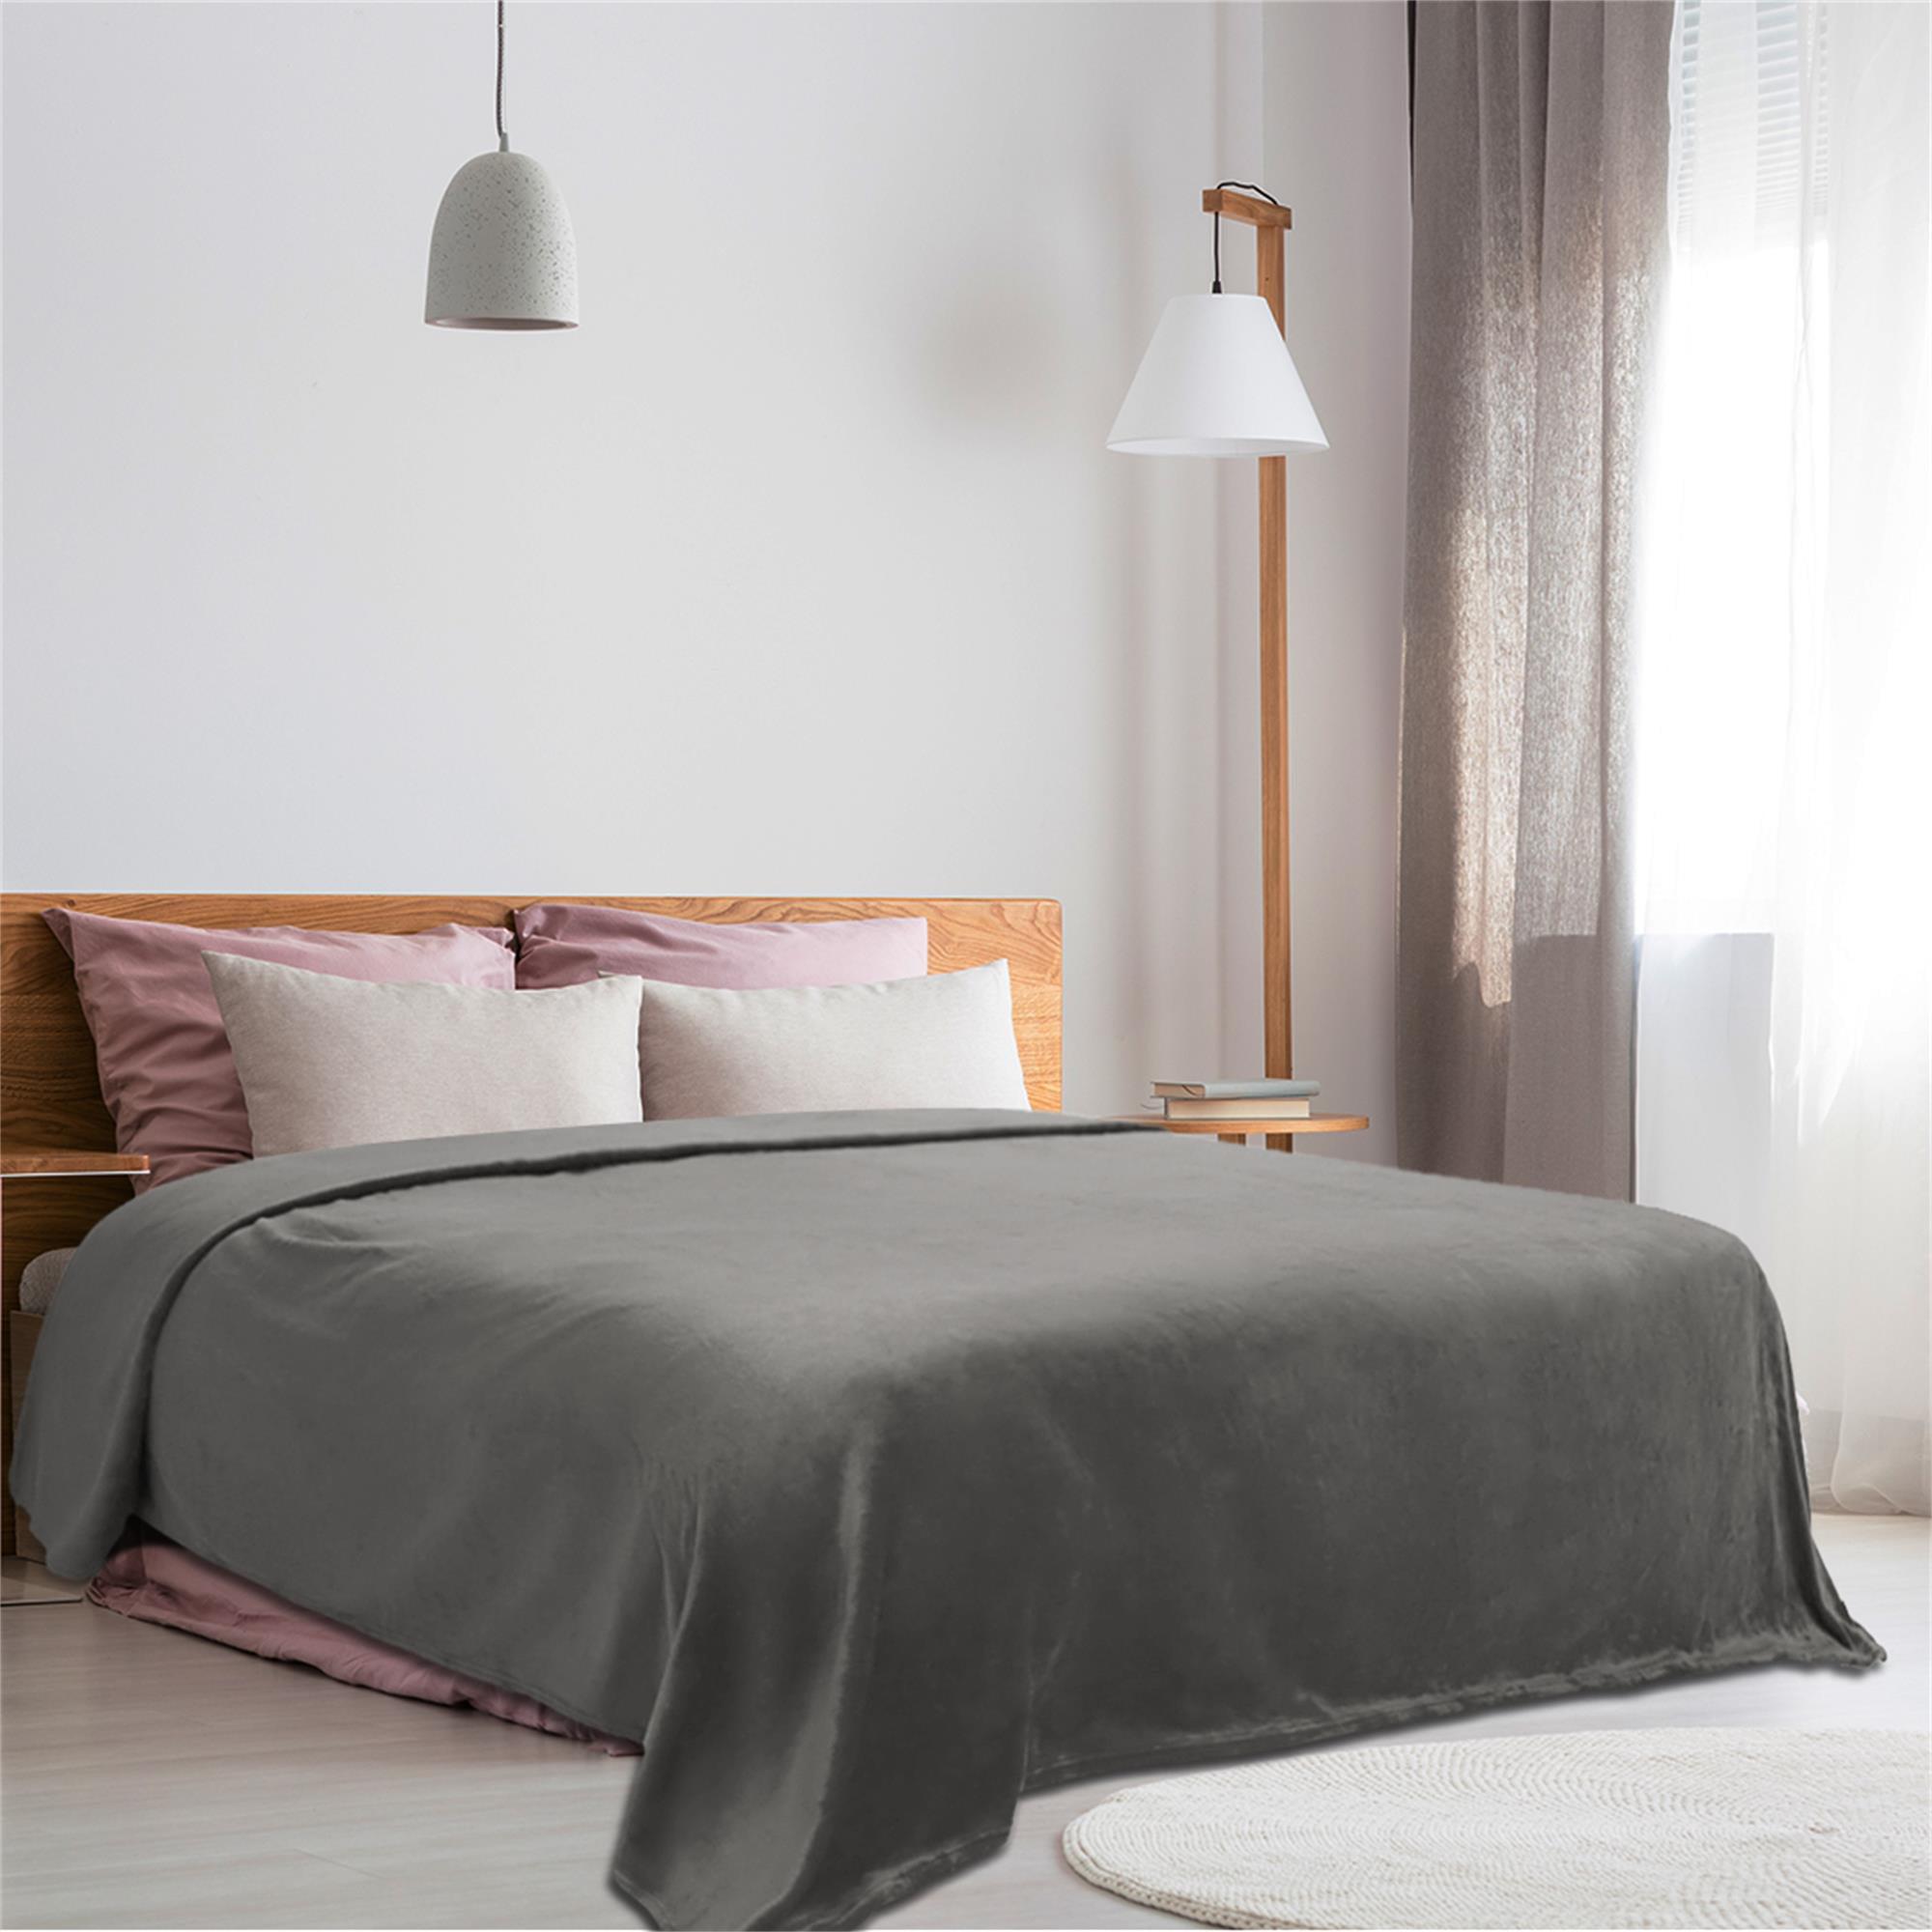 Fleece Blankets Soft Fluffy Flannel Plush Throw Blanket